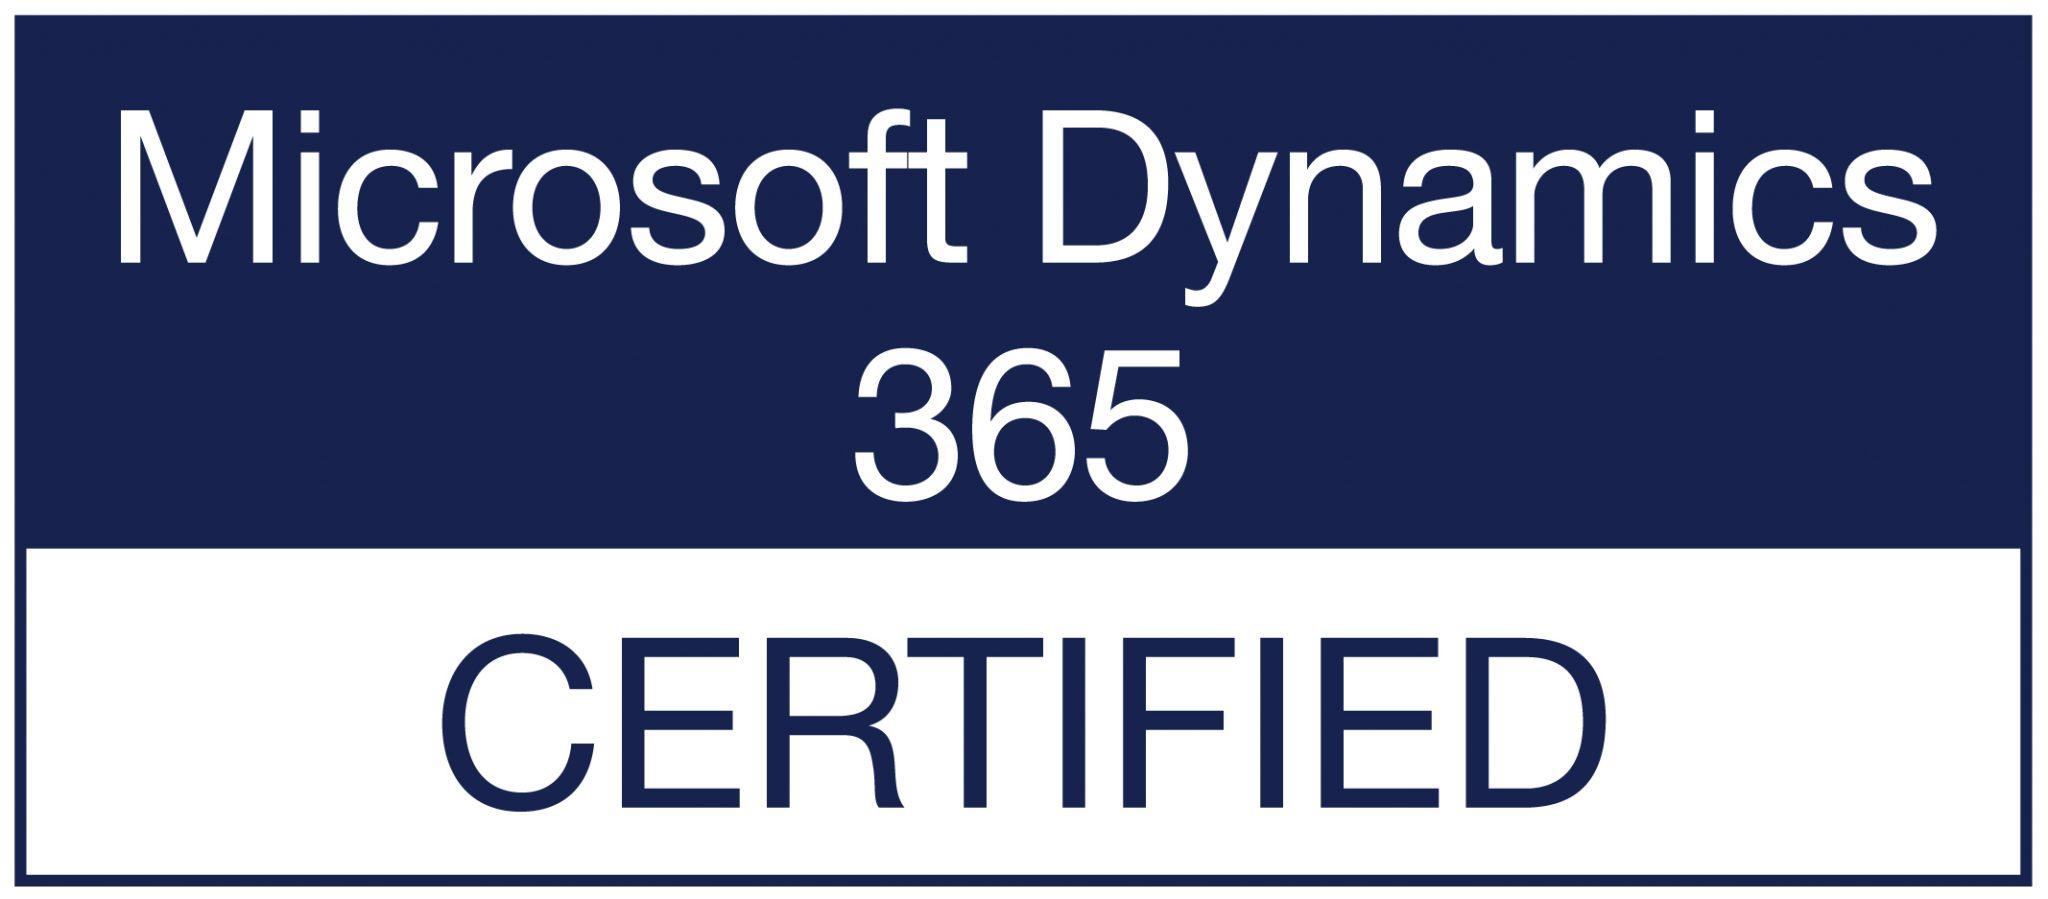 microsoft-dynamics-scalable-logo-1